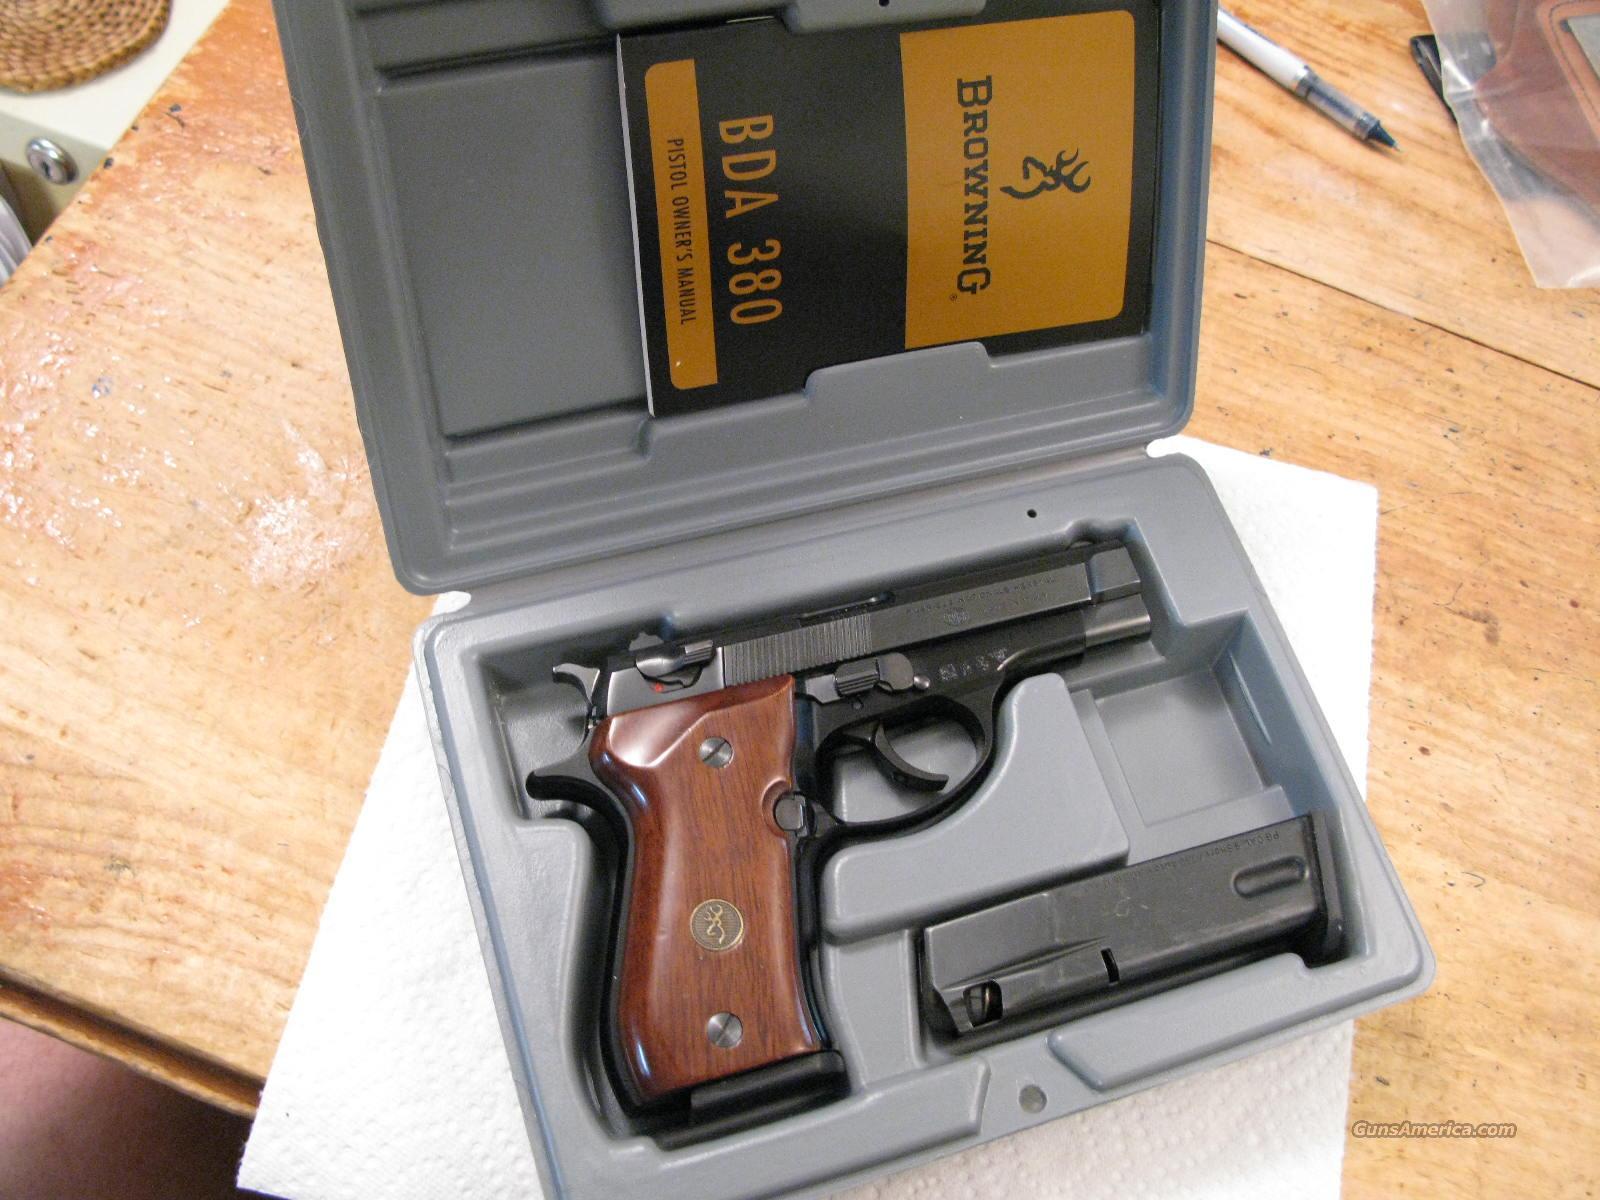 BROWNING BDA 380 pistol Owners Gun Manual